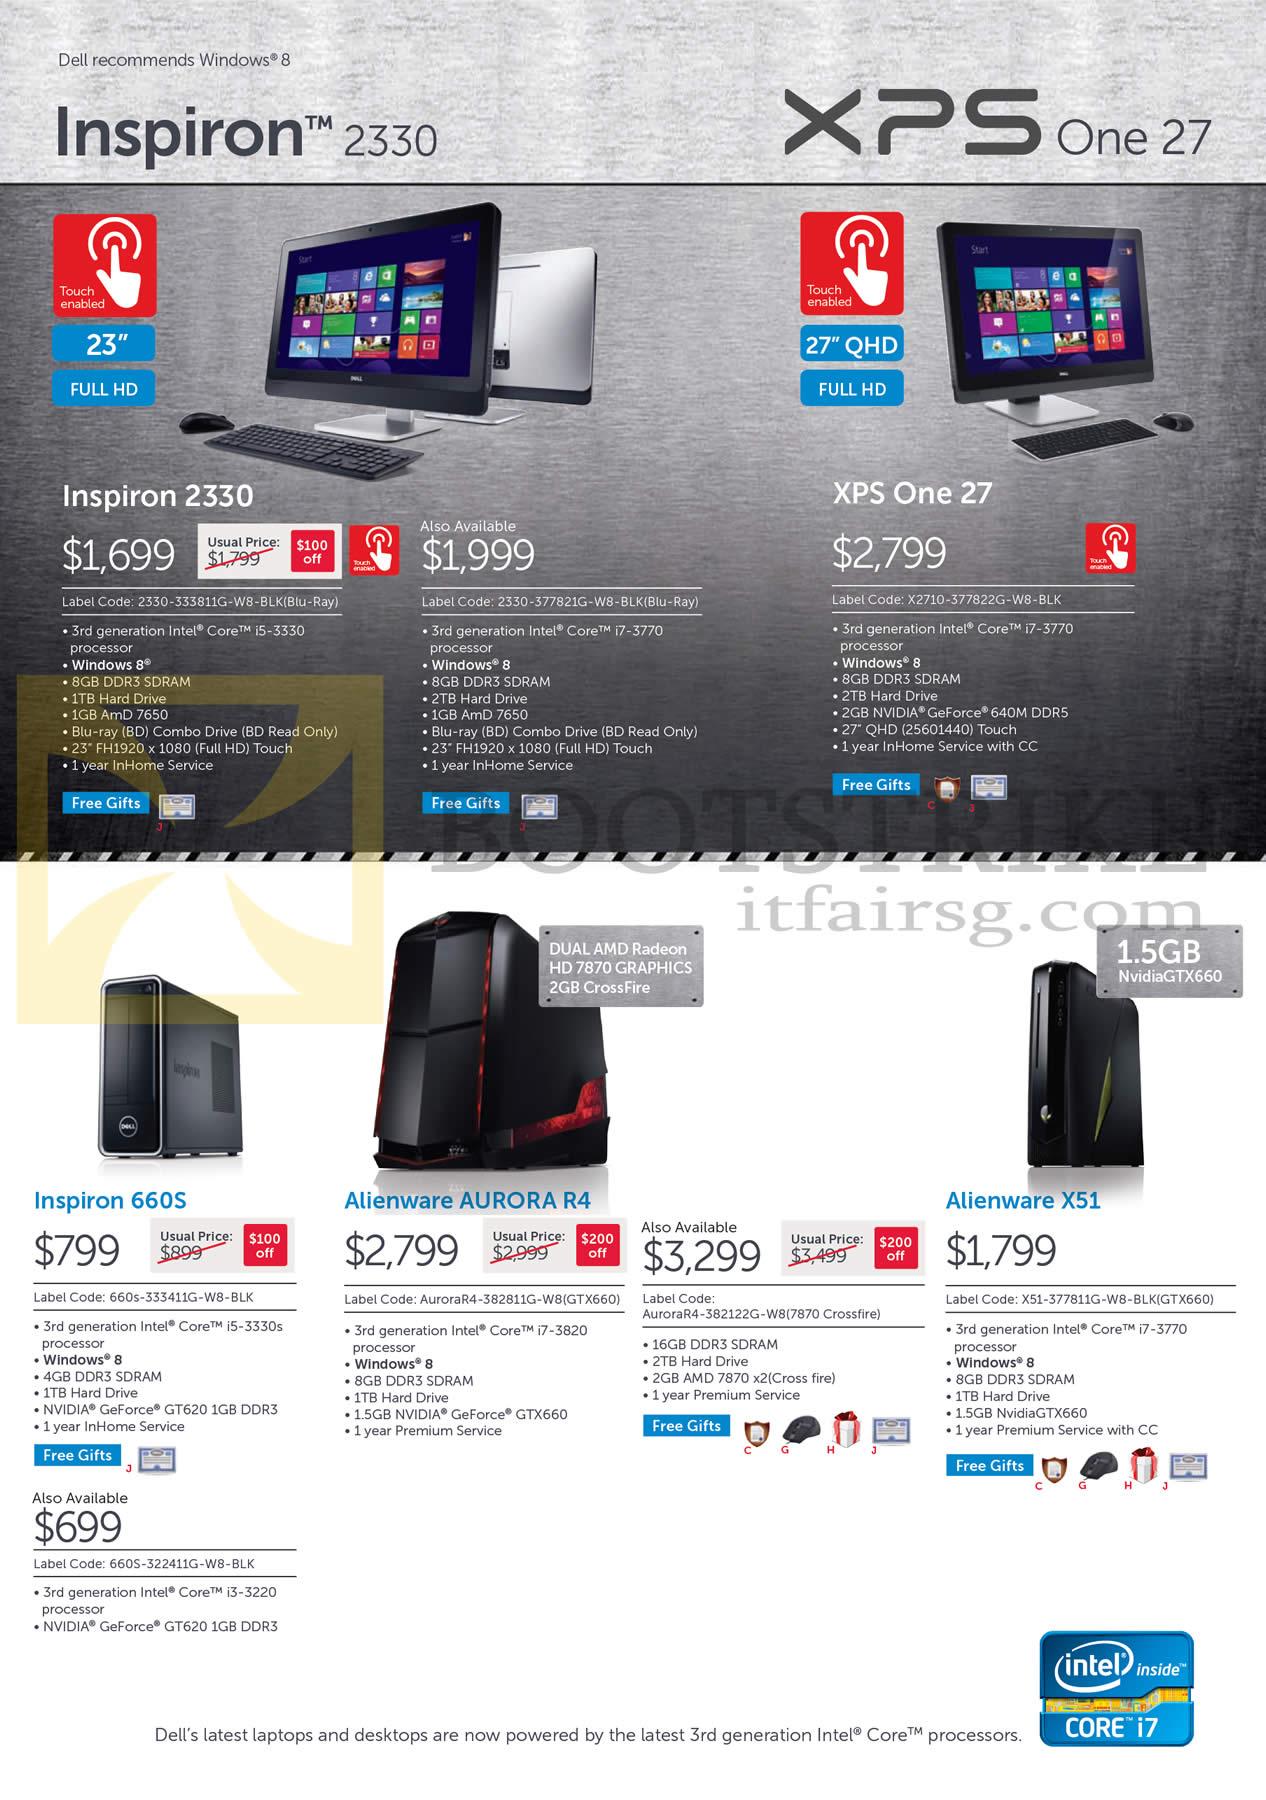 PC SHOW 2013 price list image brochure of Dell Desktop PCs AIO Inspiron 2330, 660S, Alienware X51, Aurora R4, XPS One 27